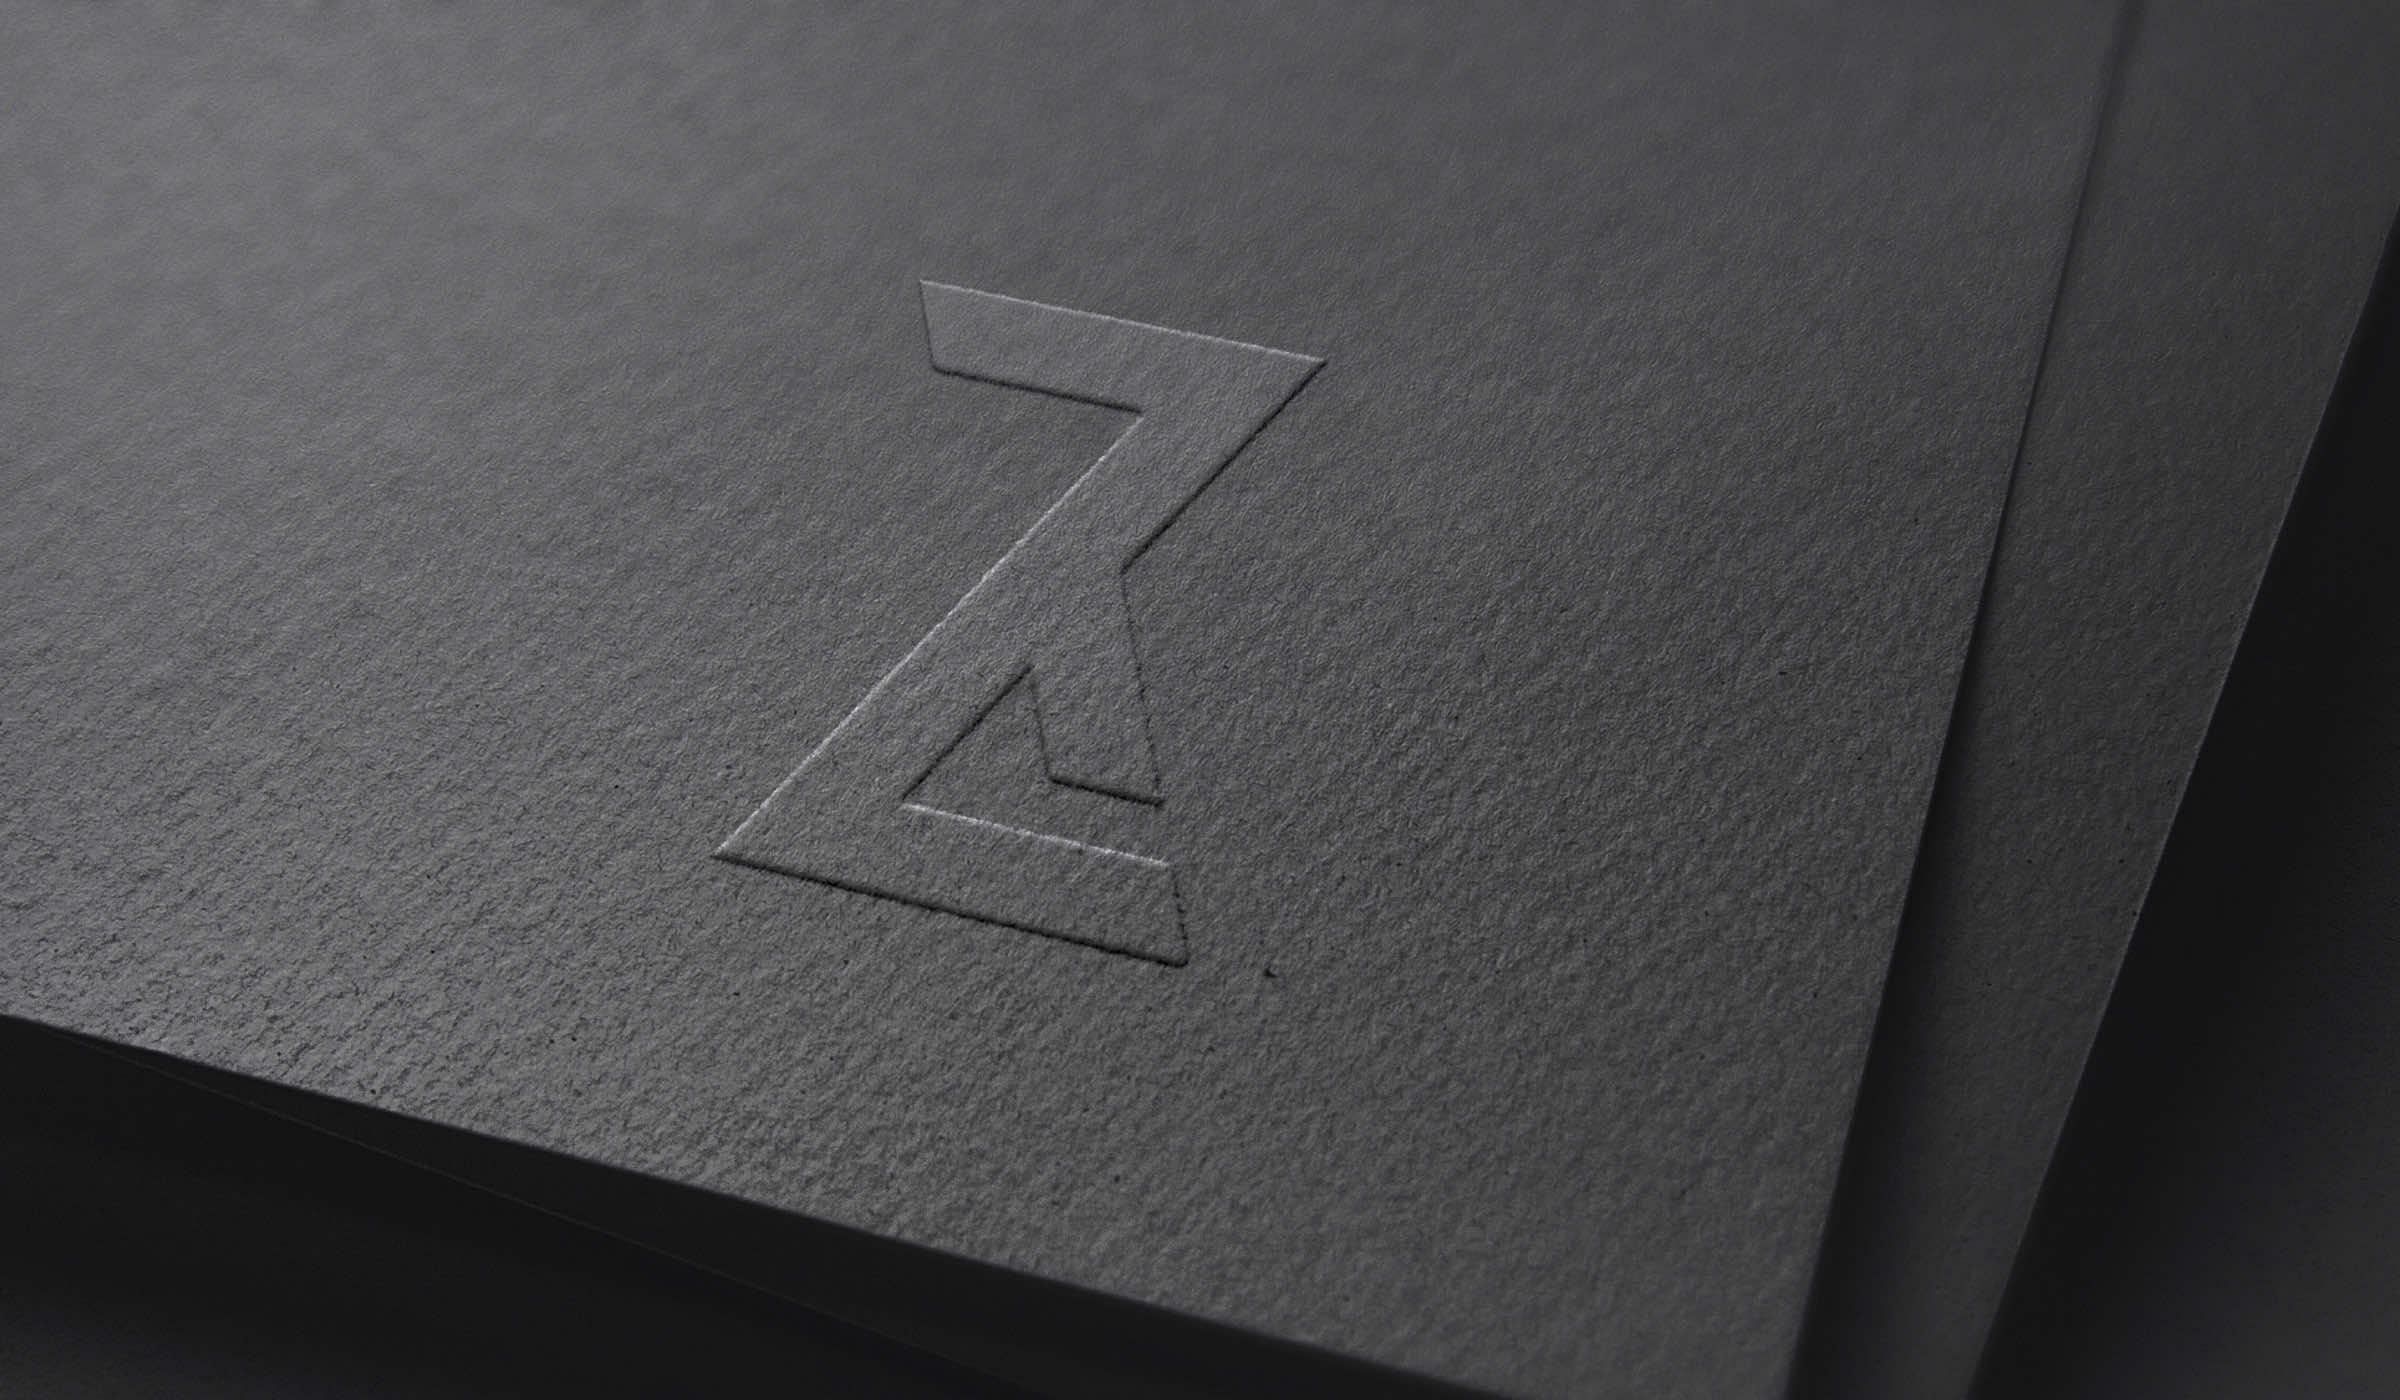 Zub Architecture